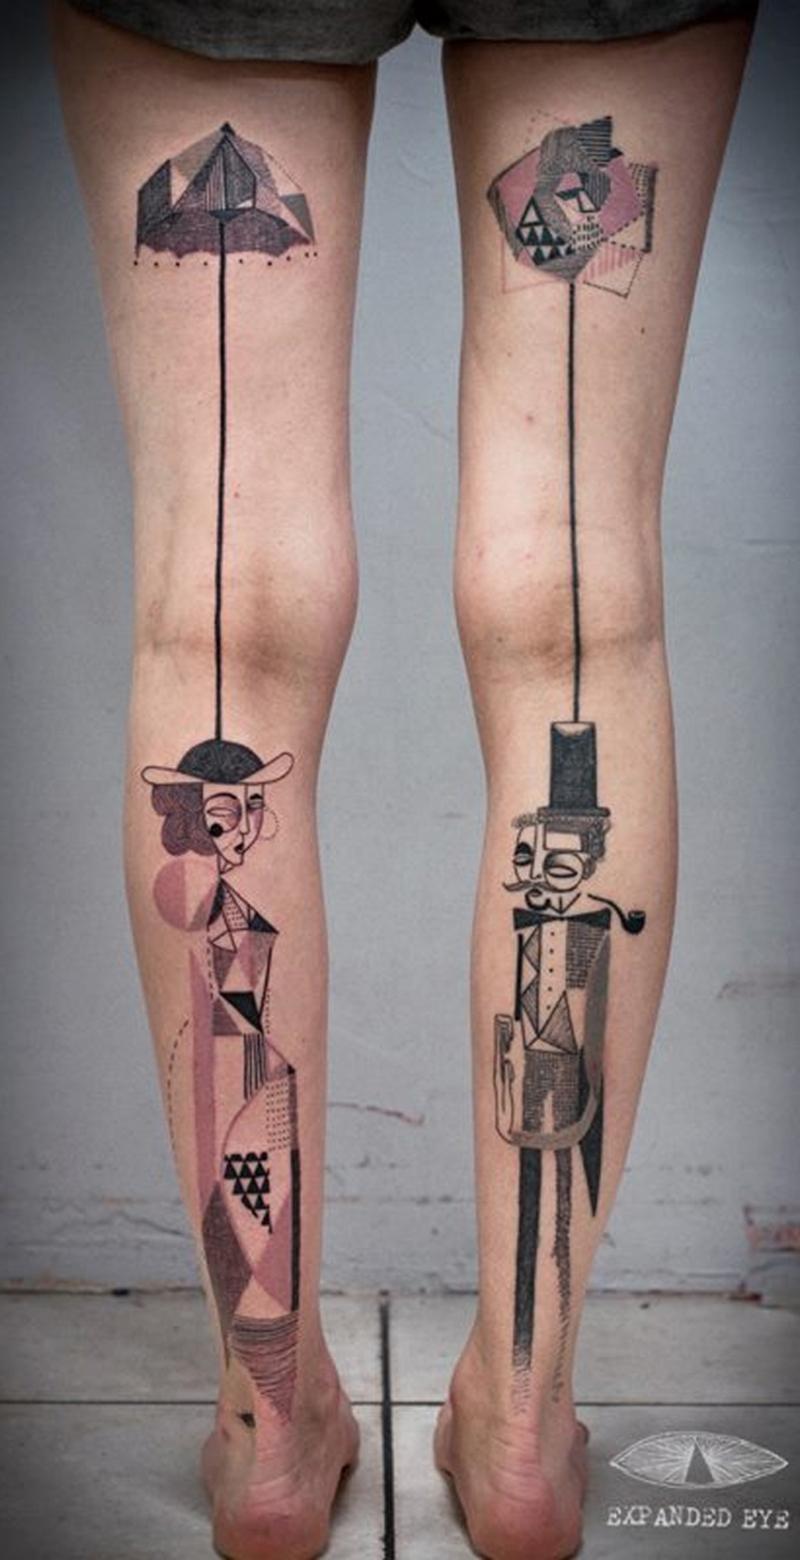 Tatuajes Musica Electronica tatuajes que marcaron tendencia en 2015 - urbans mag